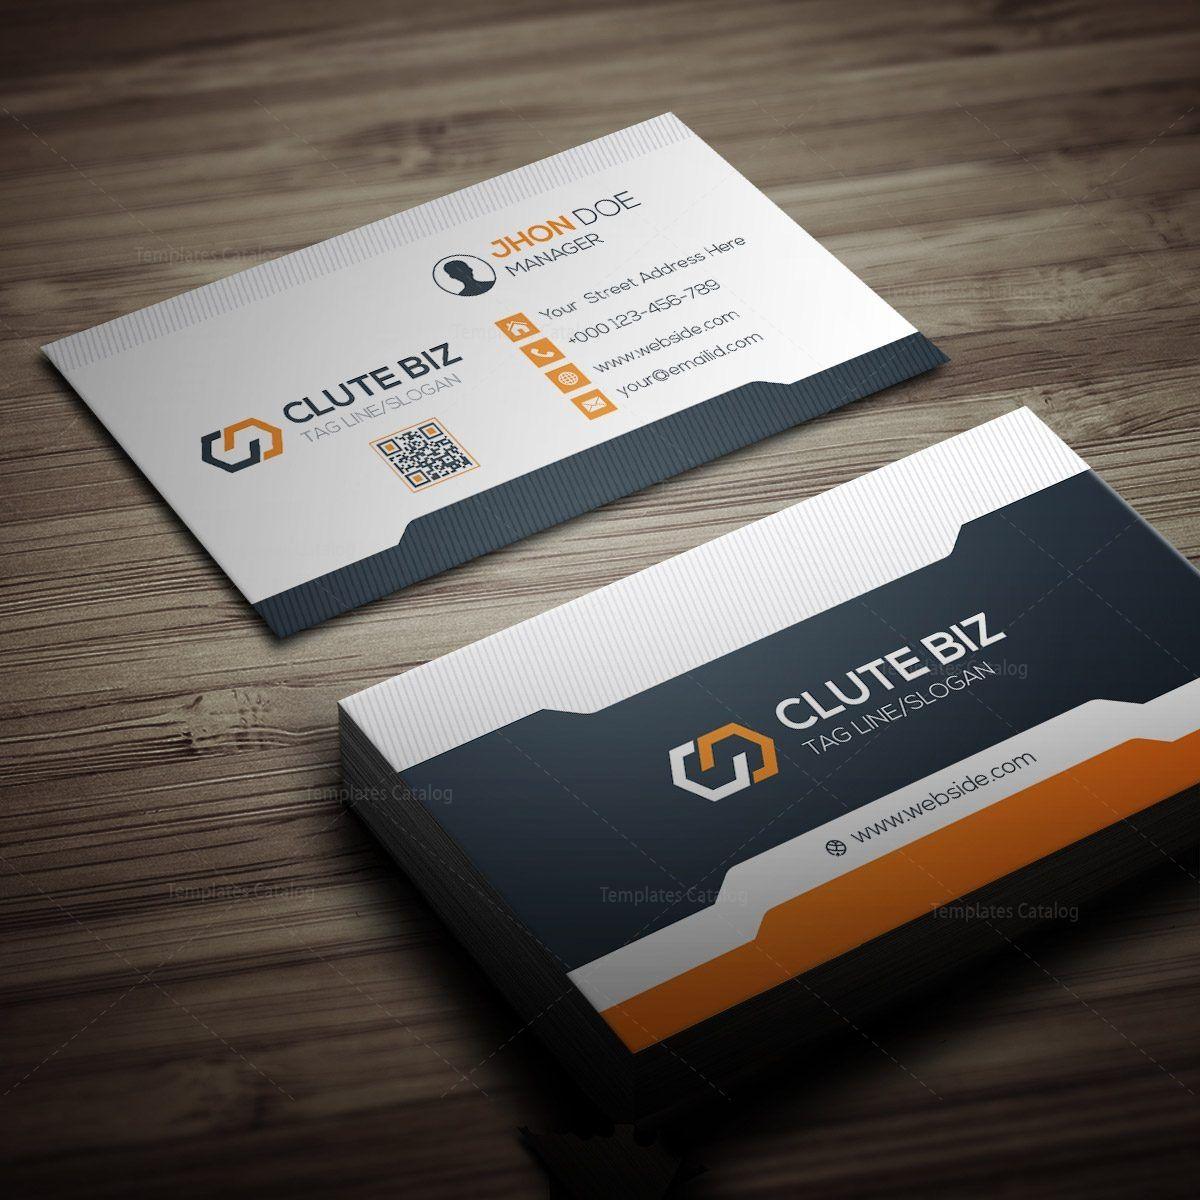 Serious Business Card Template 000260 Template Catalog Stunning Business Cards Corporate Business Card Design Business Card Template